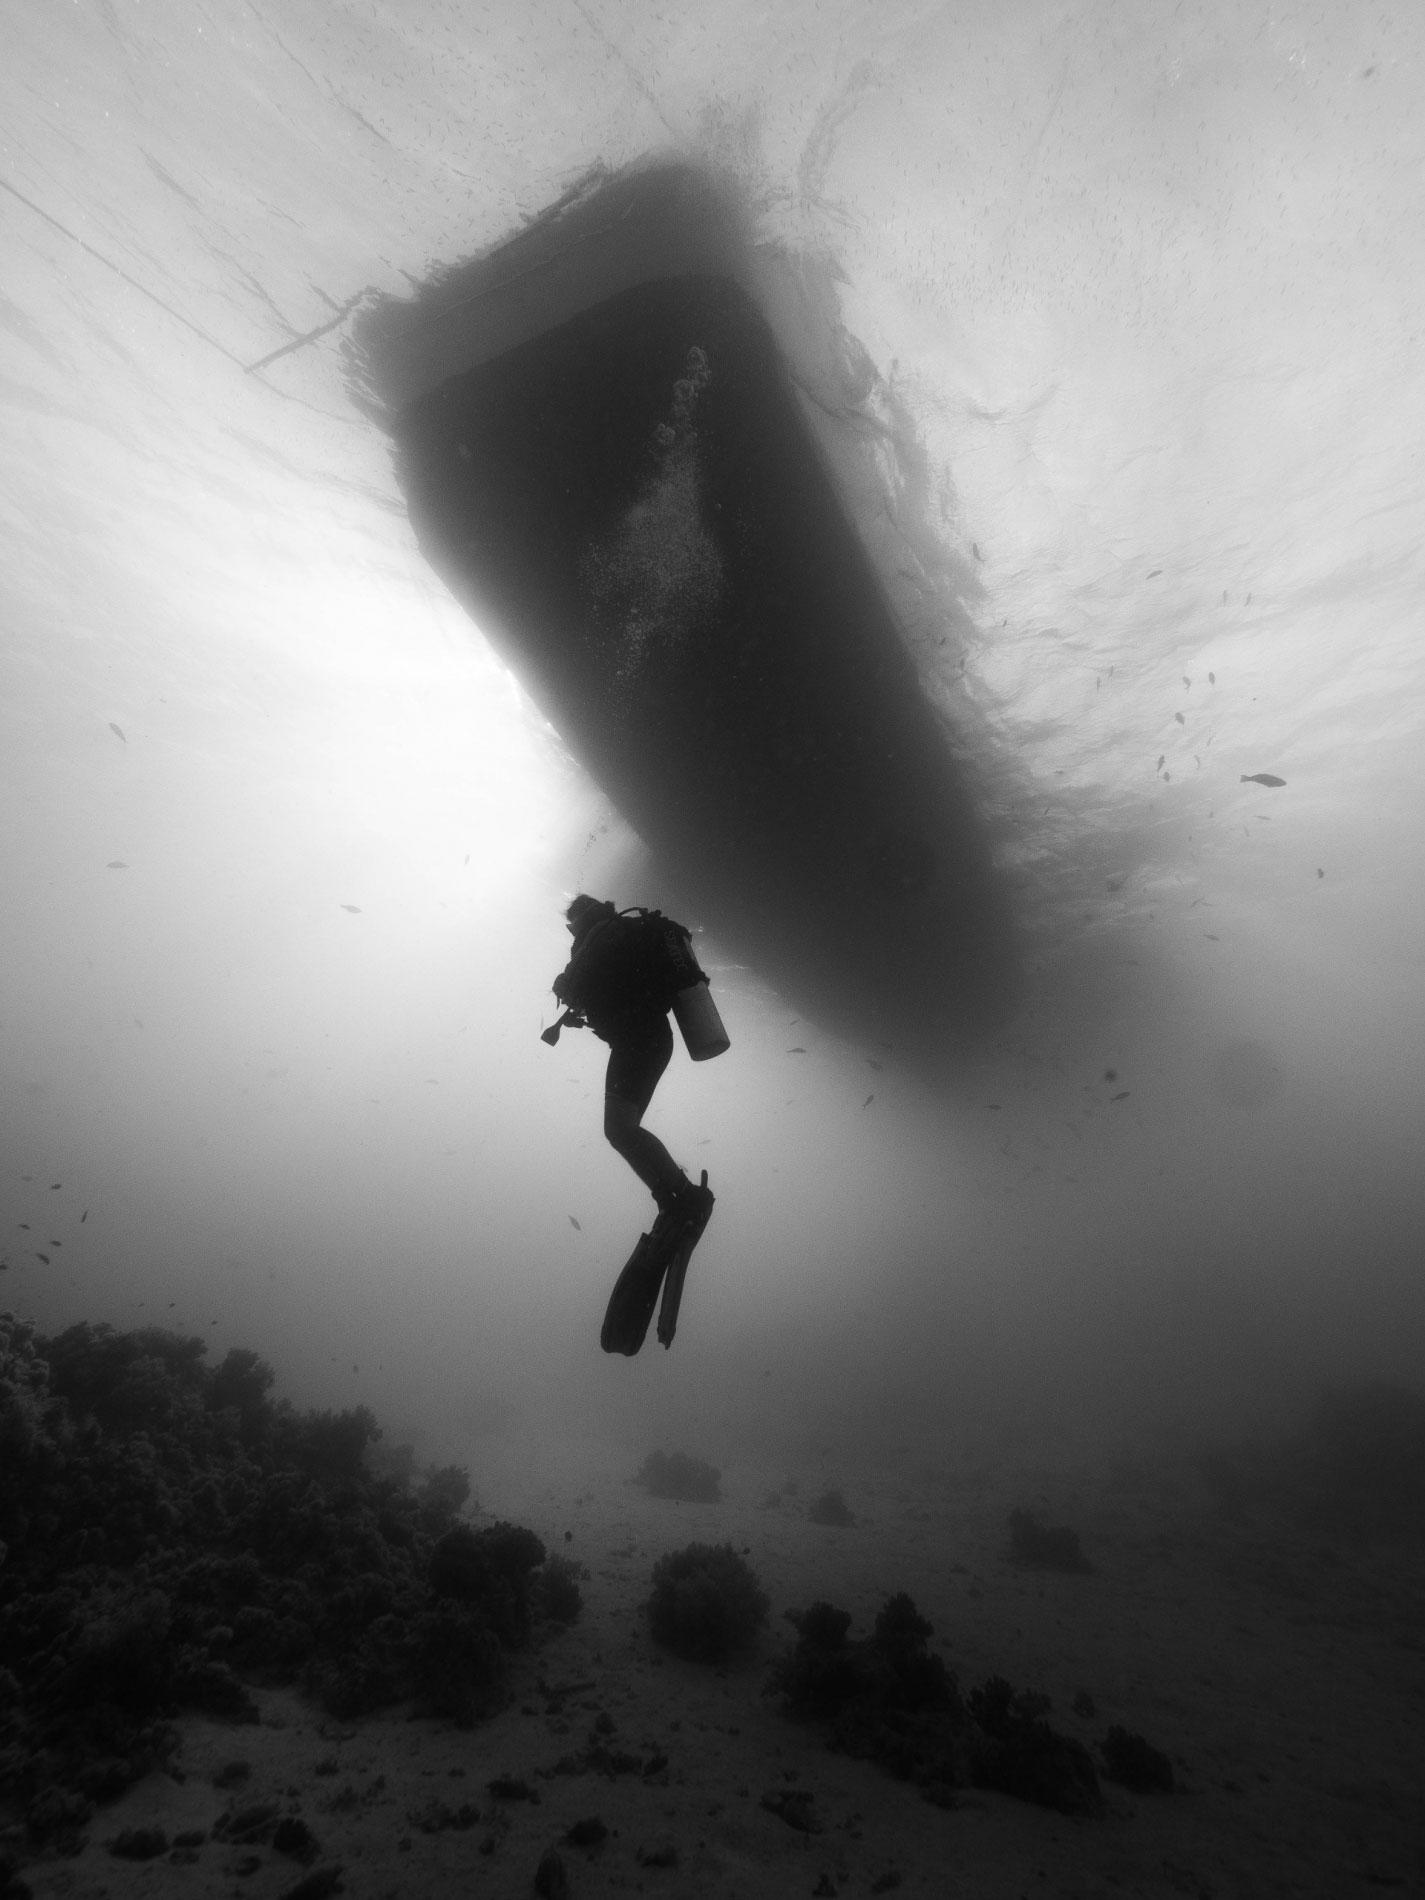 Scuba-diver-under-boat